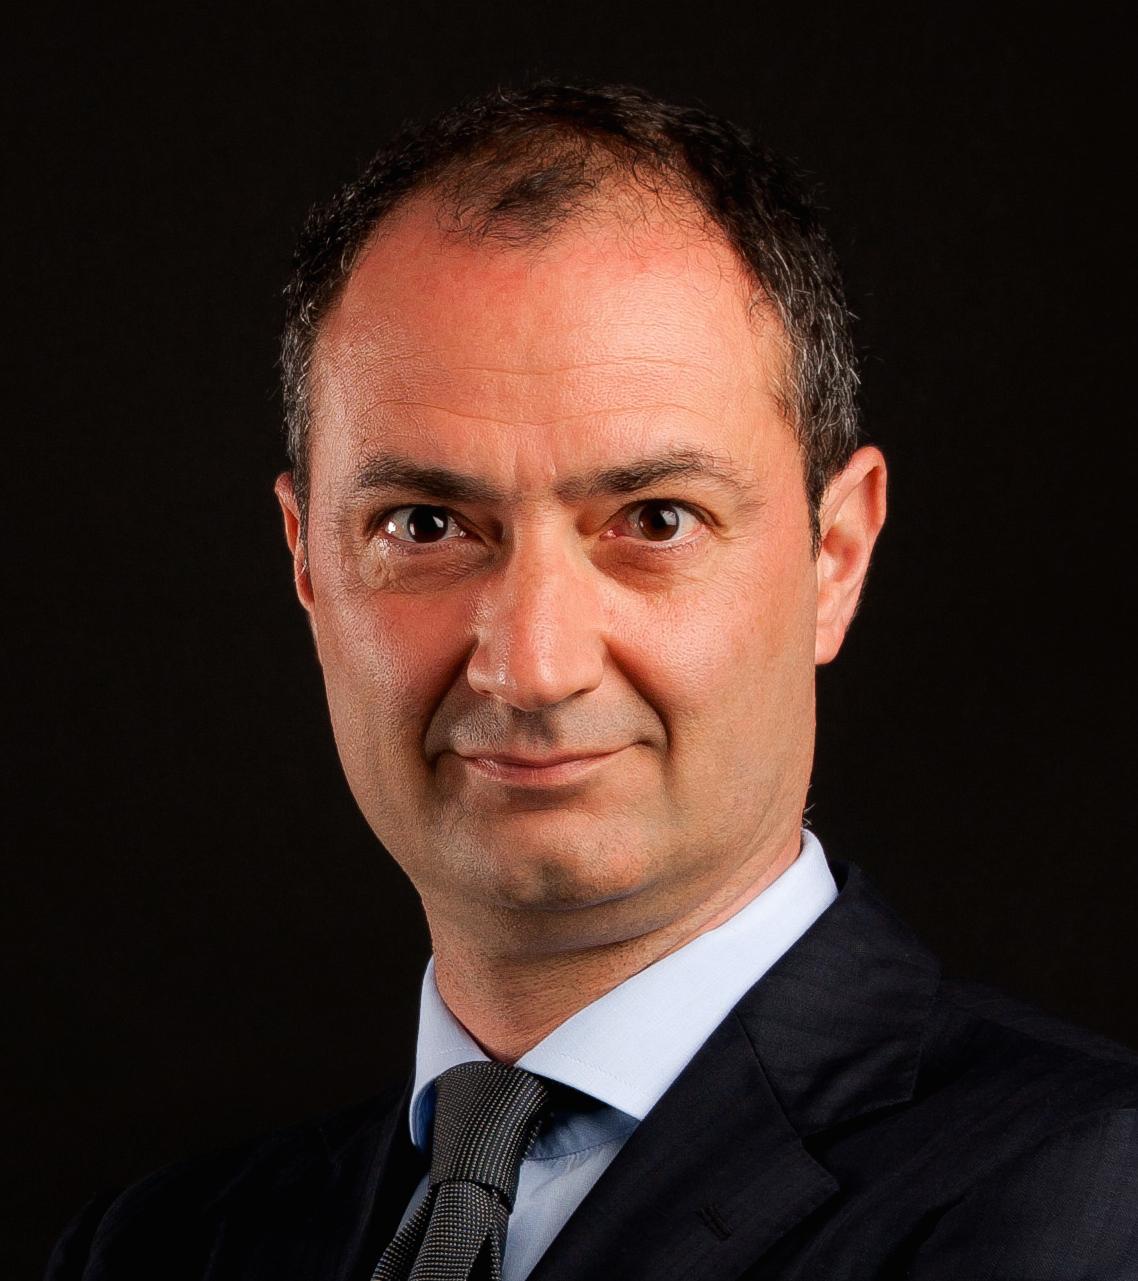 GIUSEPPE PANTALEO CORVINO - Funding & Capital Markets Forum